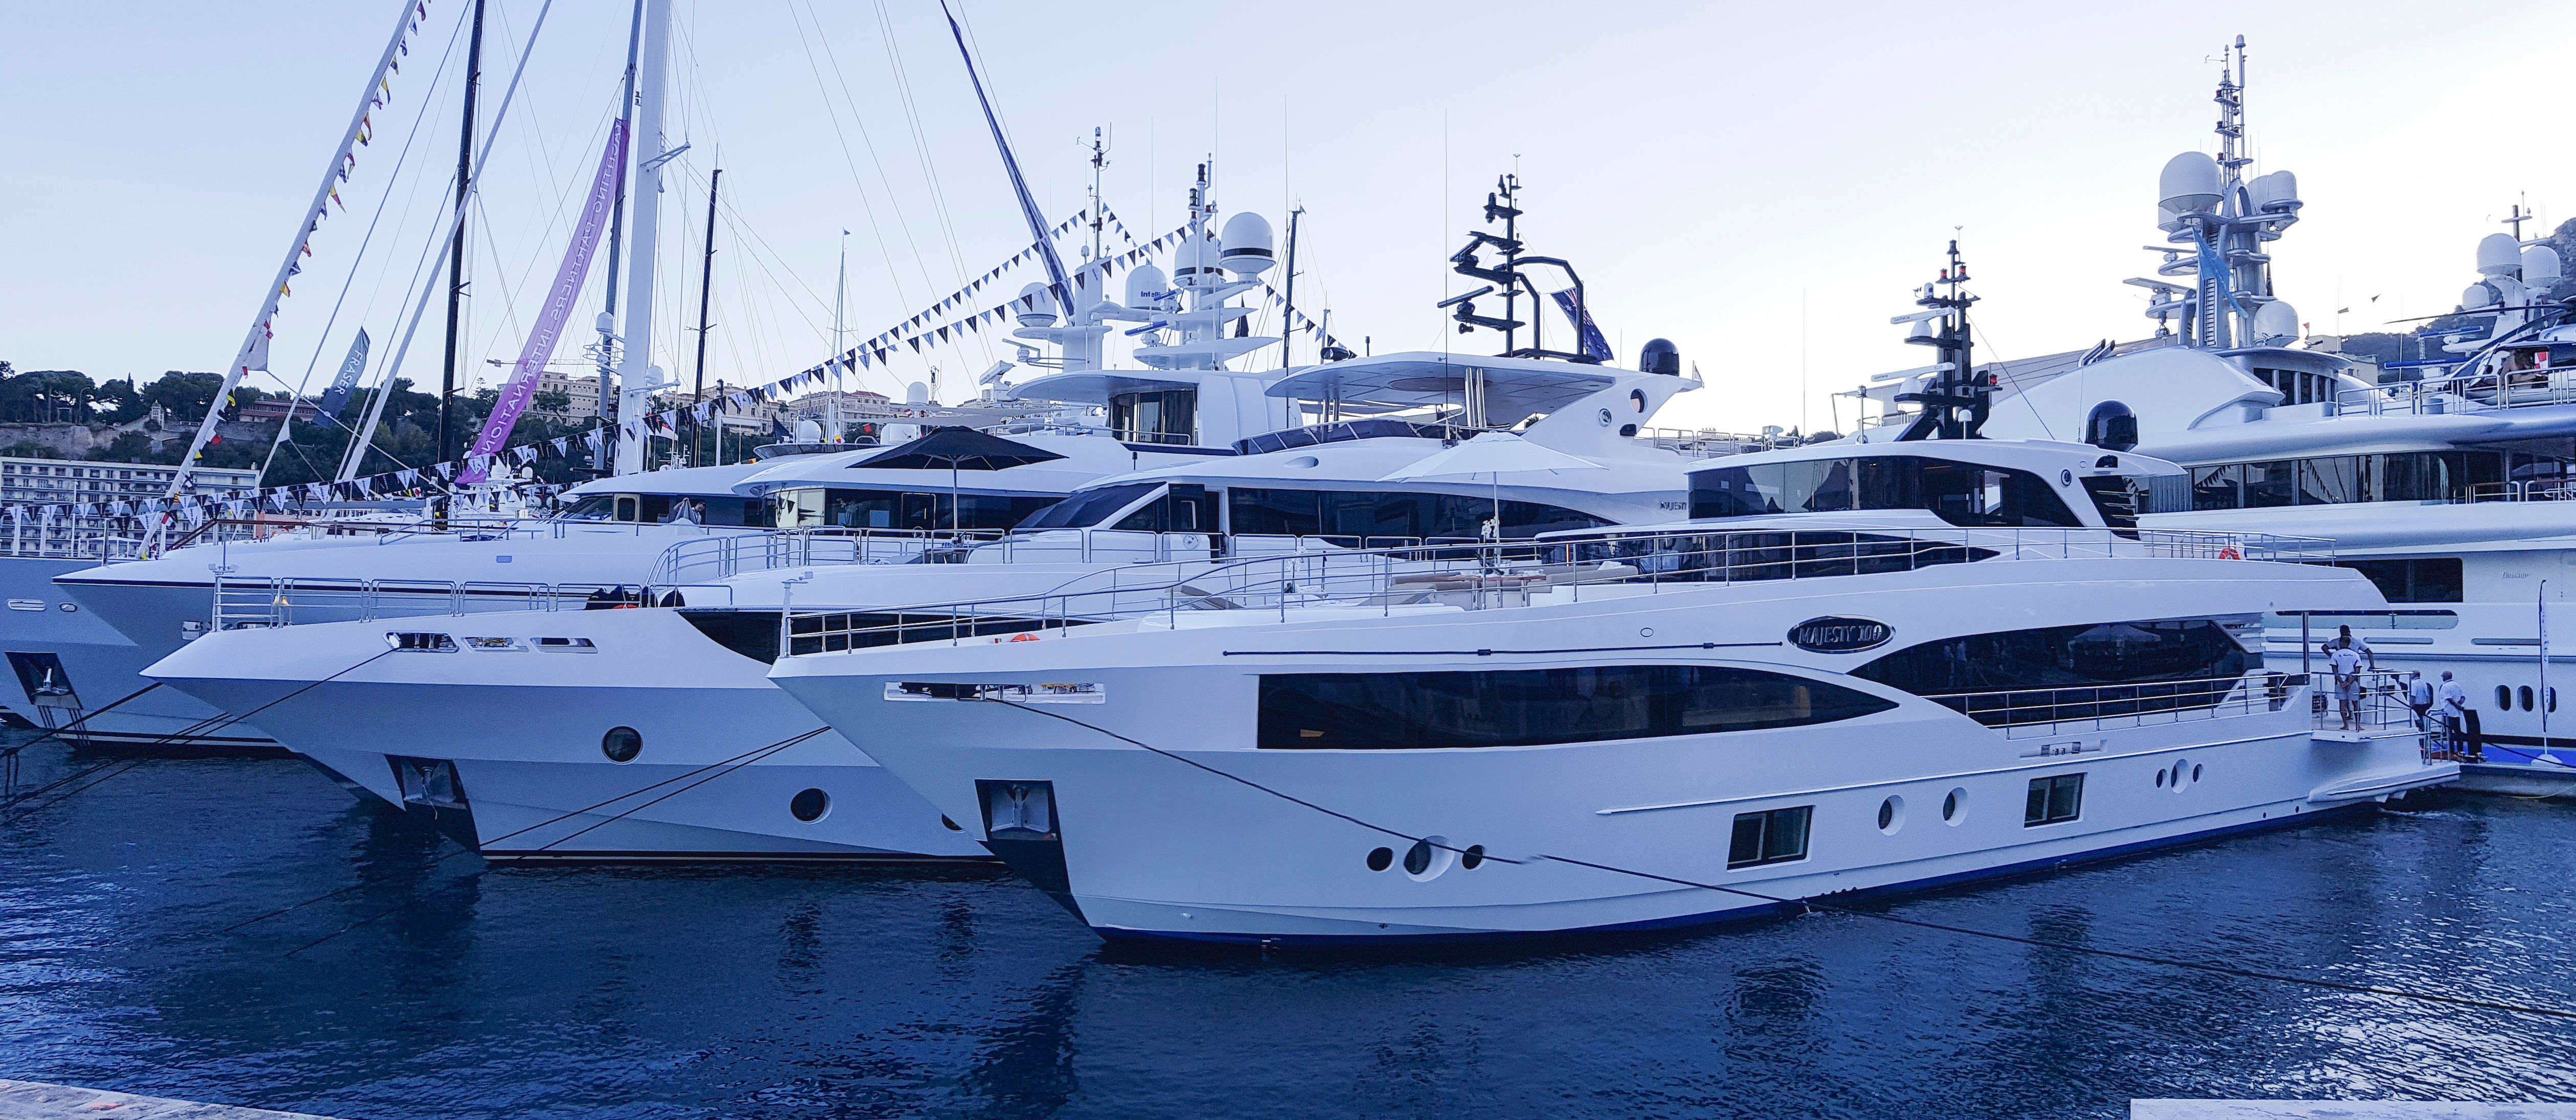 Gulf Craft at Monaco Yacht Show 2018 Day 1 (16).jpg